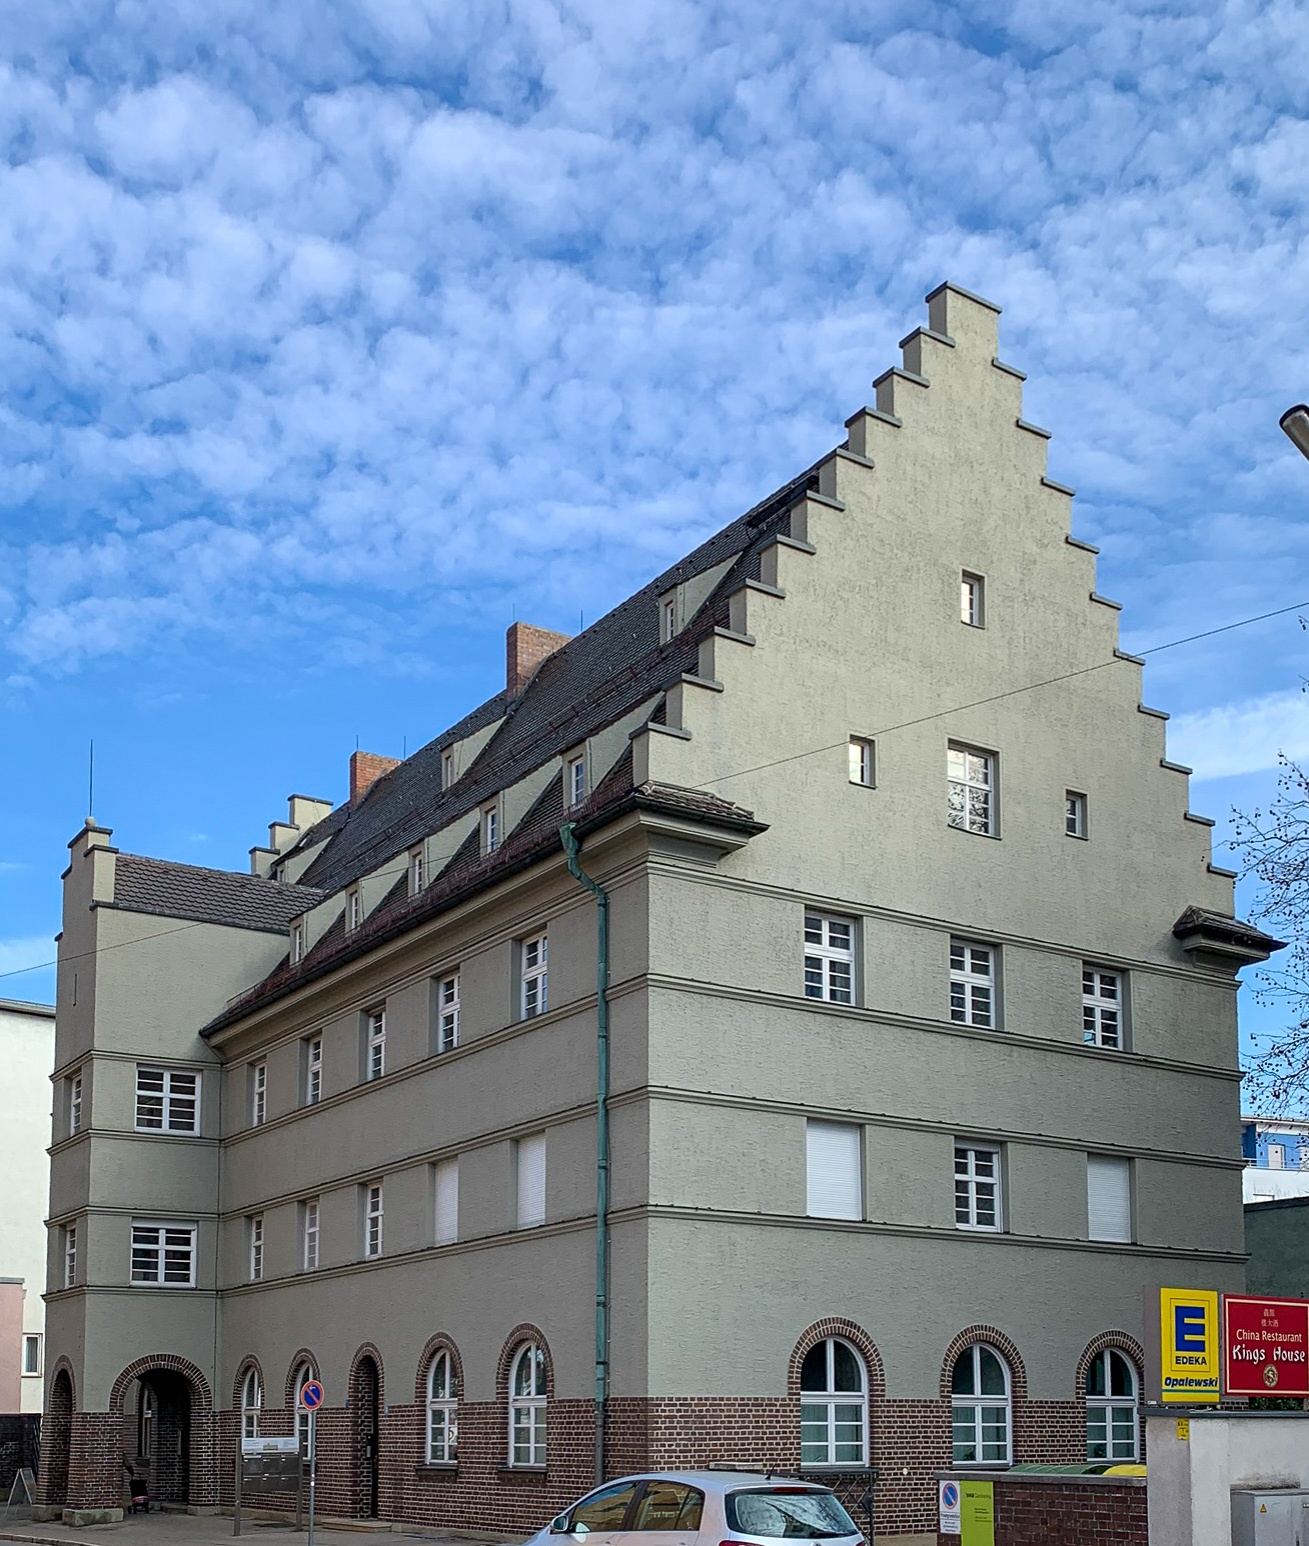 Post Office, 1925-1926. Architect: Thomas Wechs